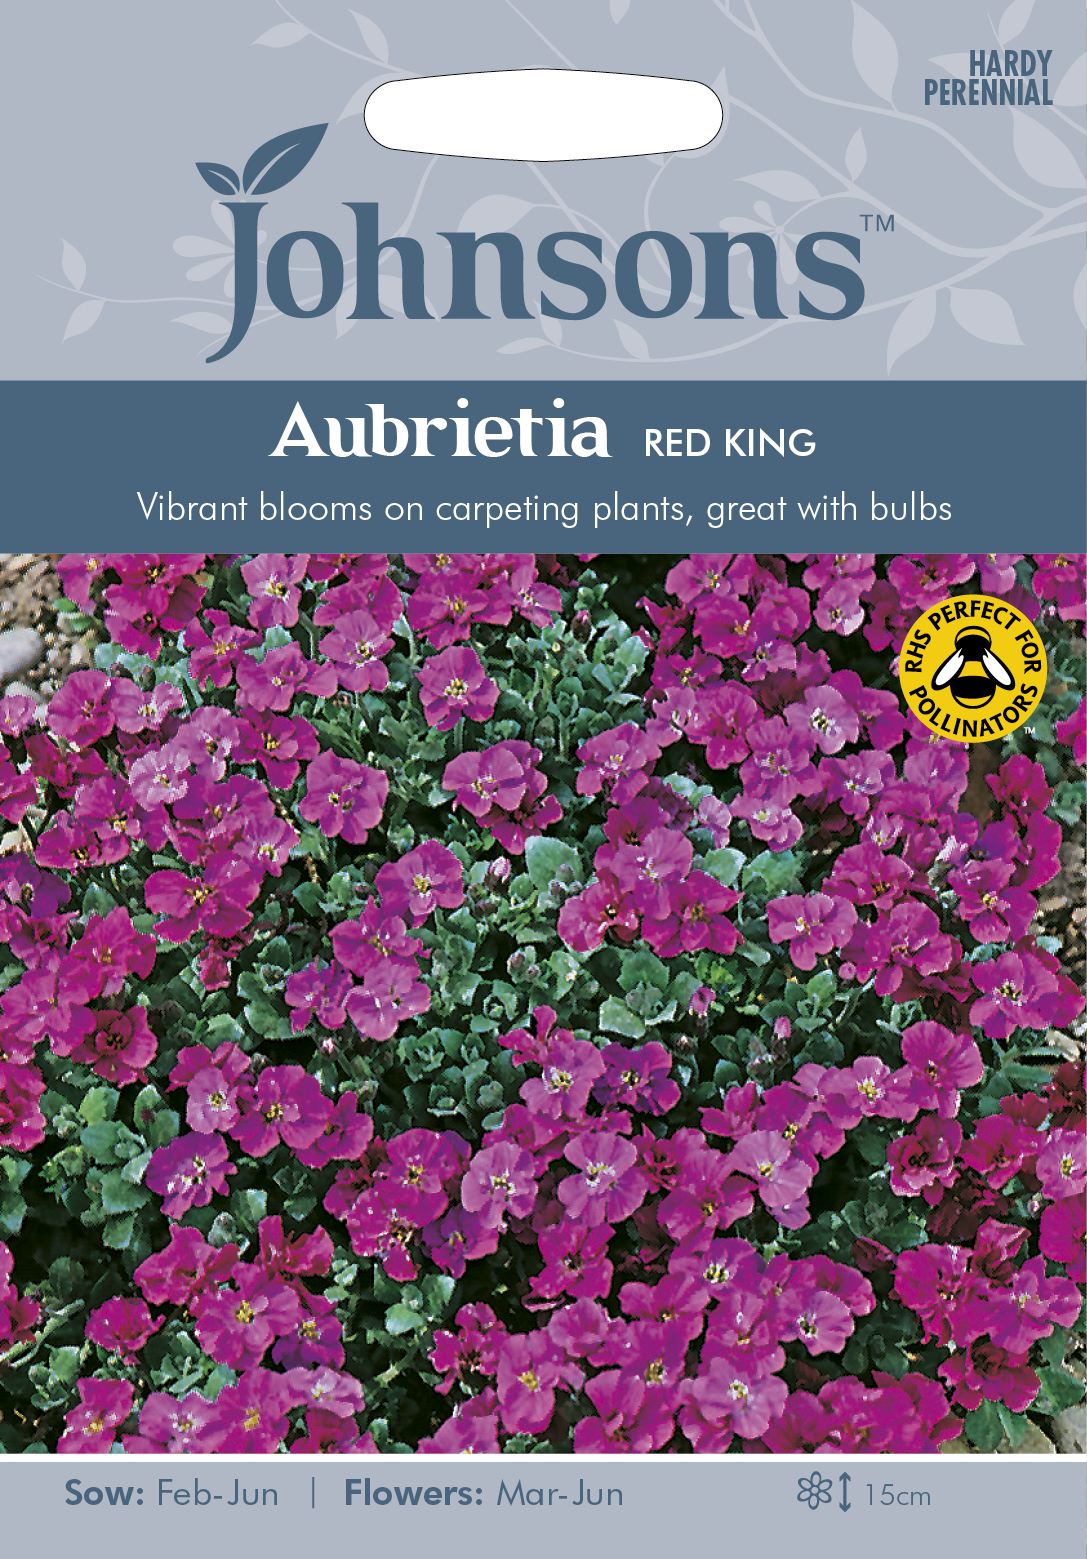 Aubretia 'Red King